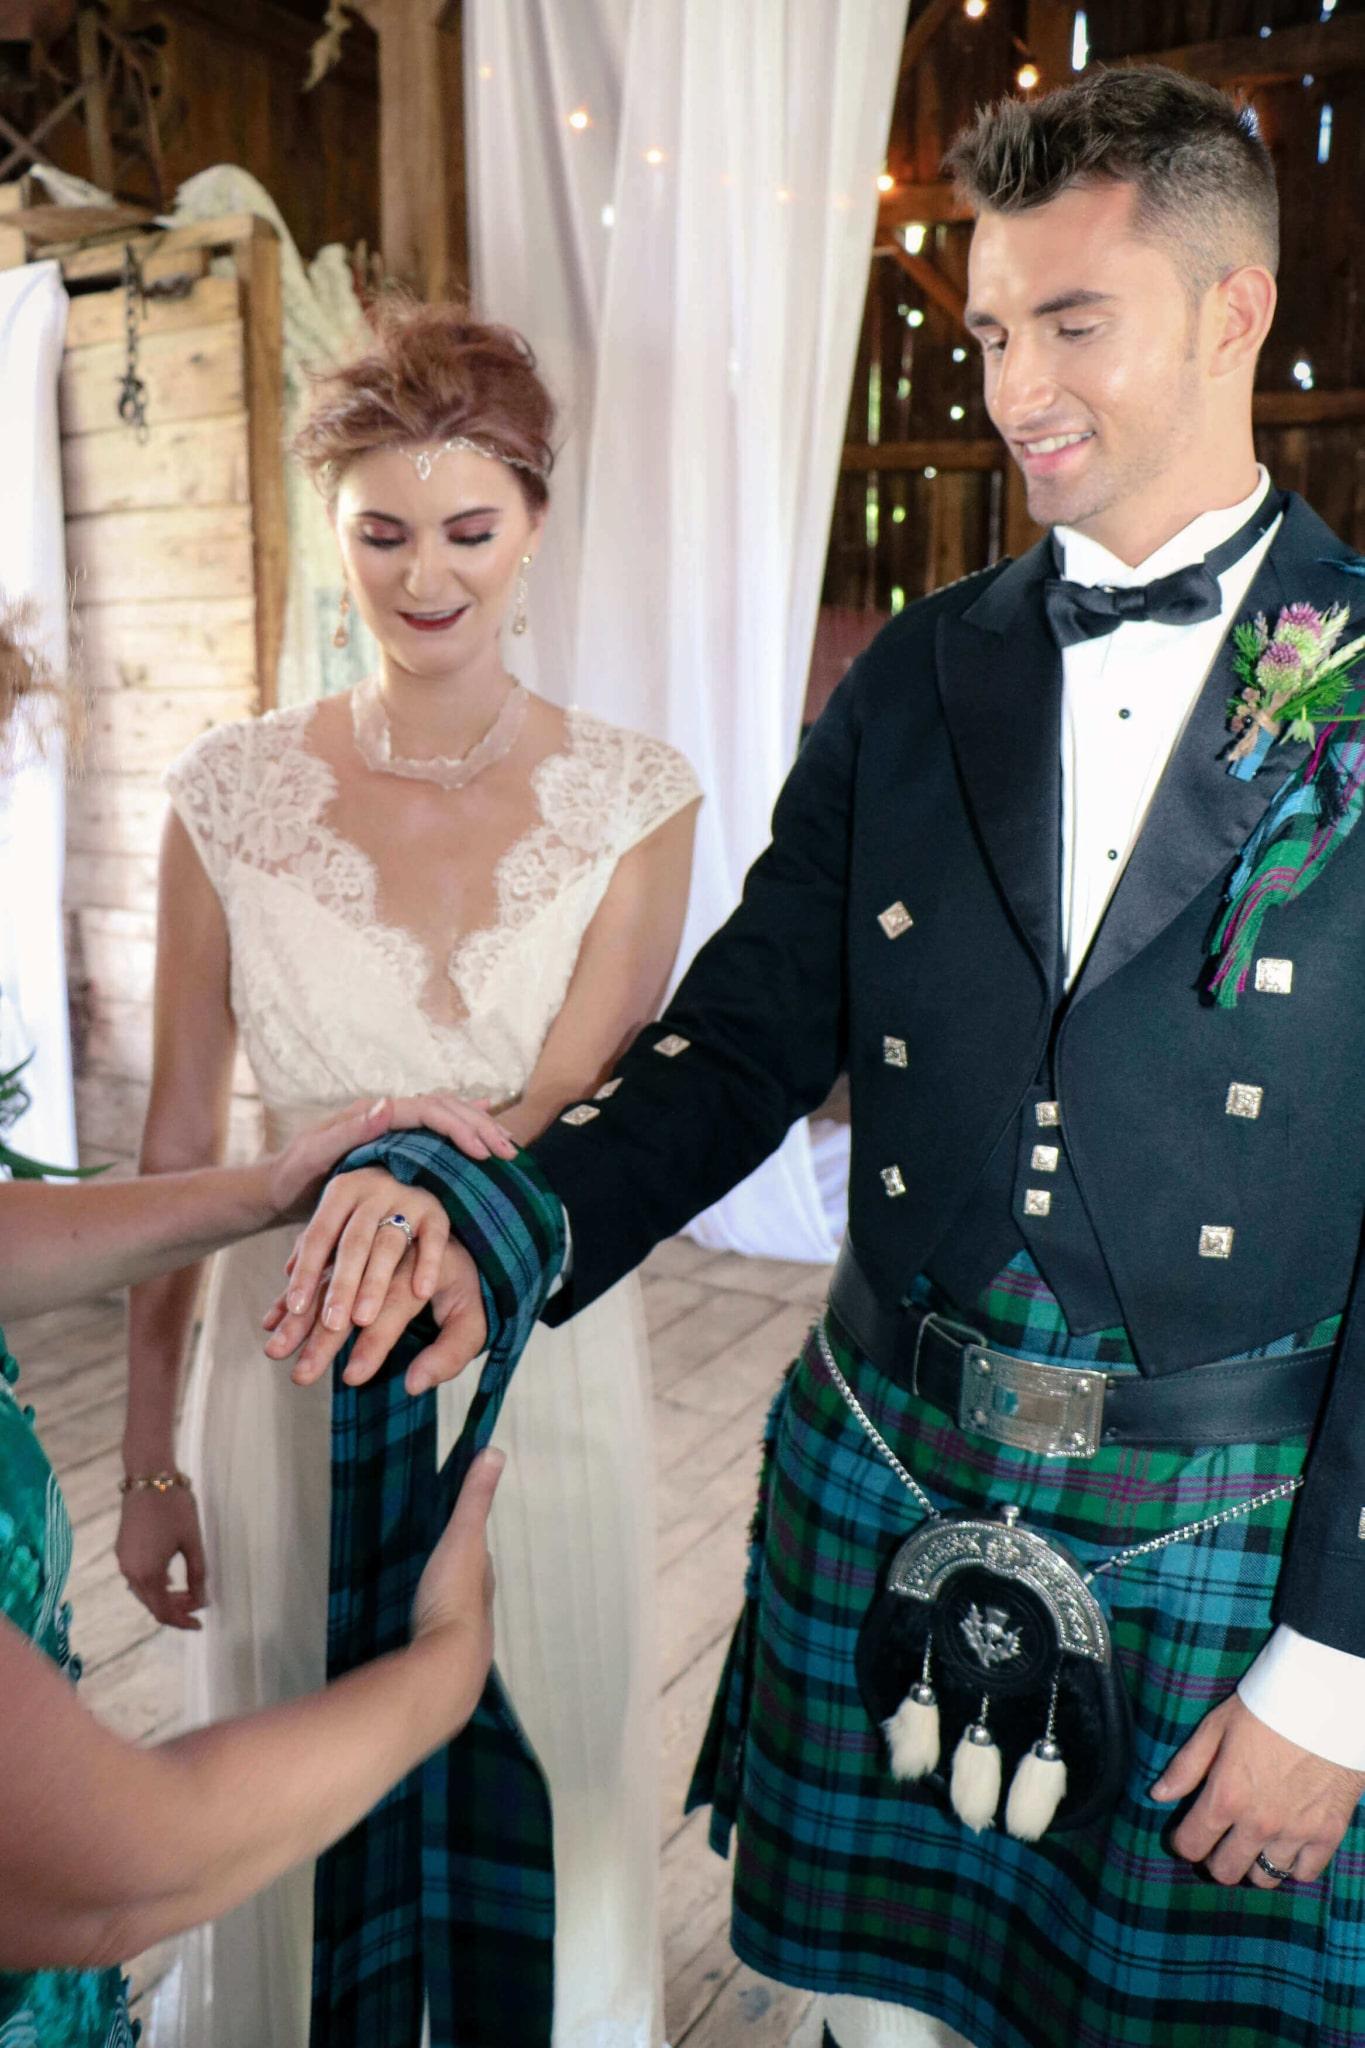 Rental Handfasting ribbon in celtic wedding ceremony